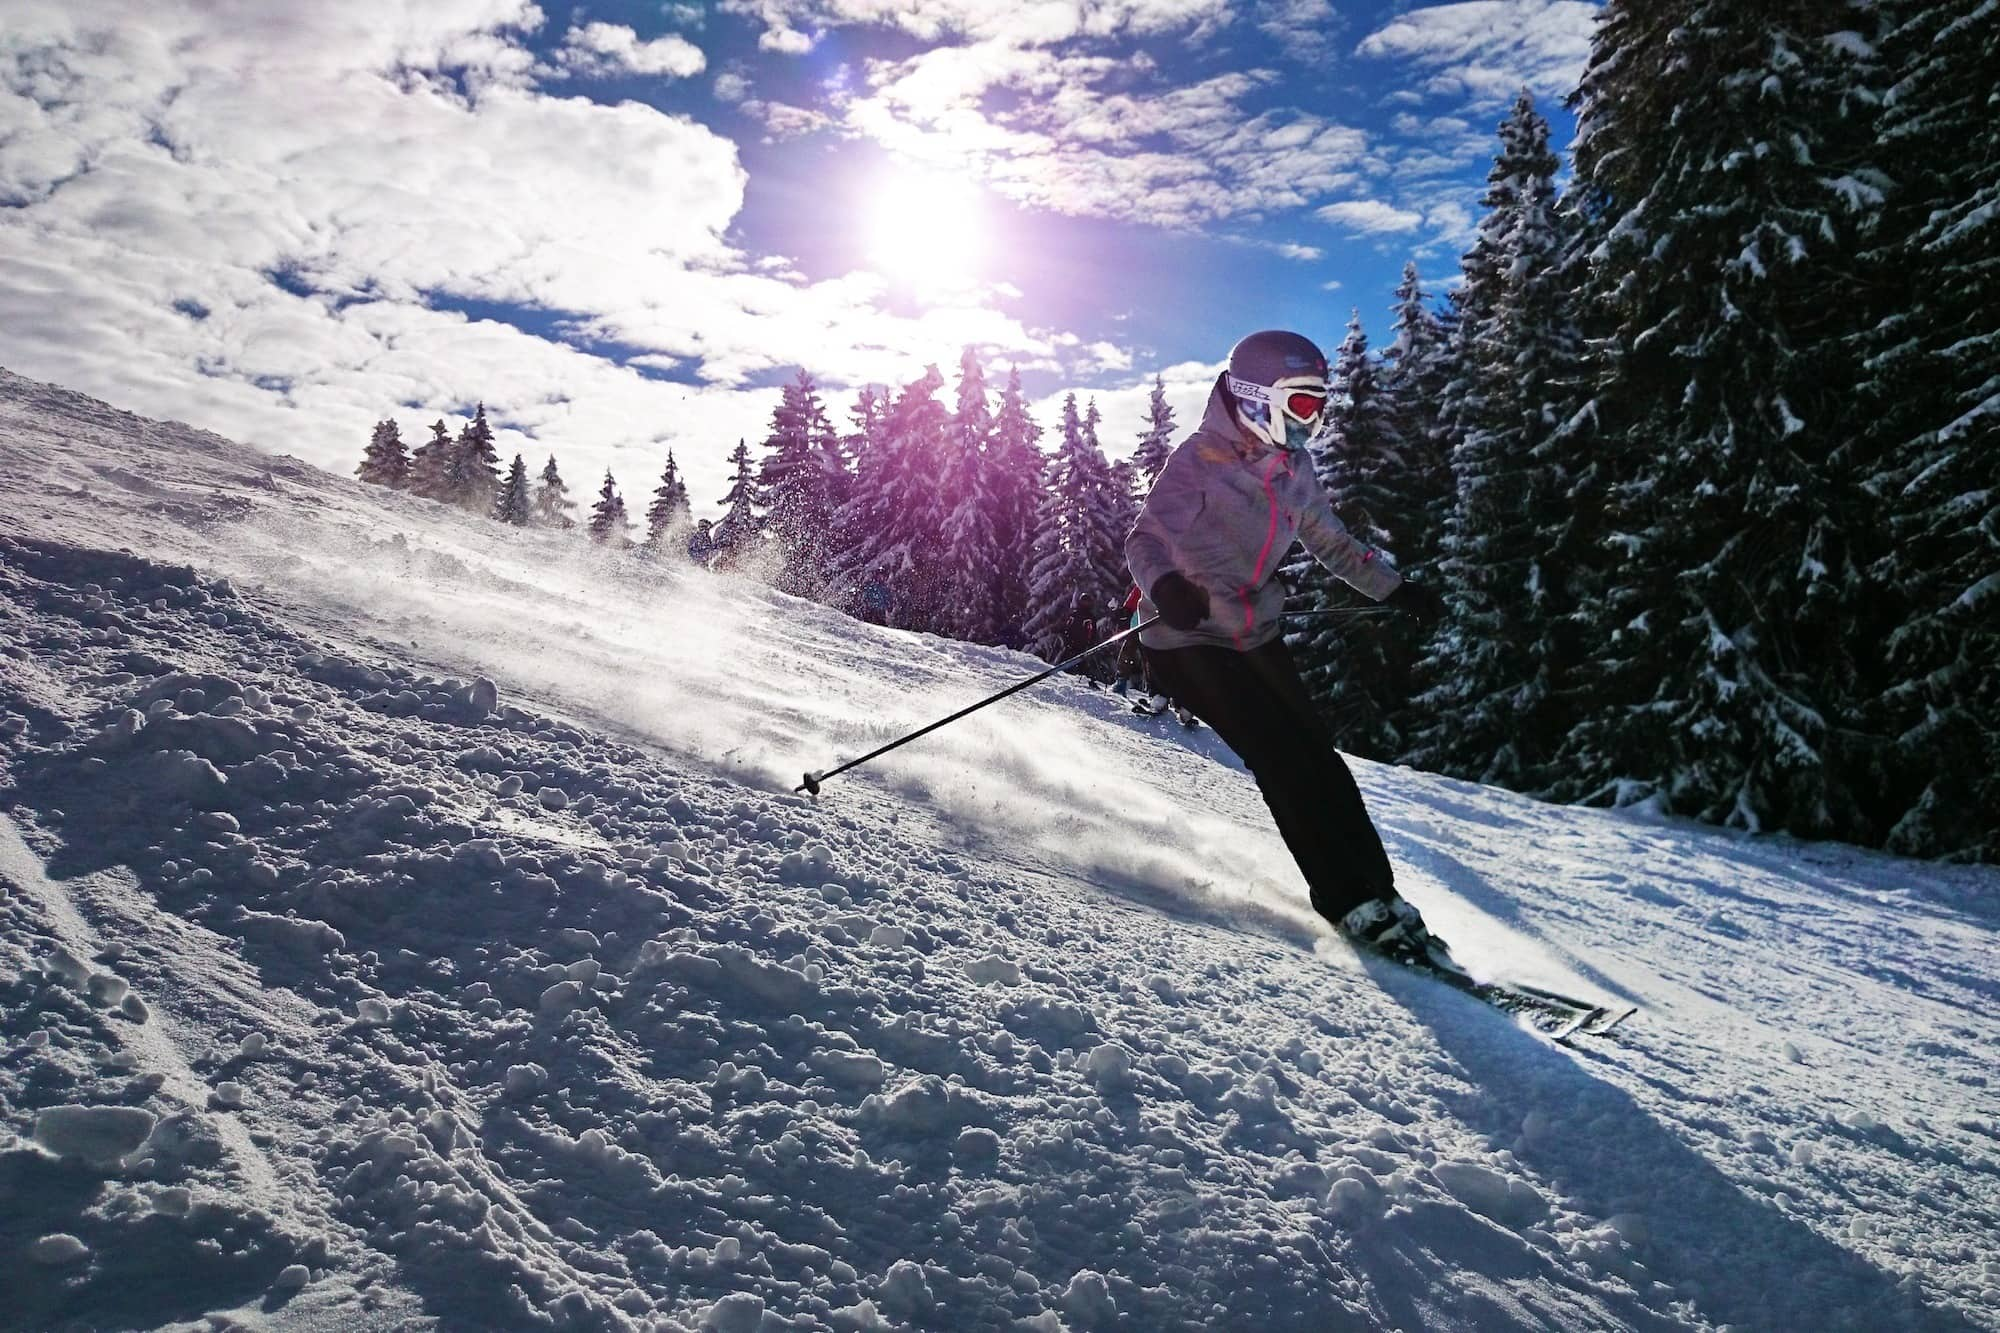 Colorado Gems: 11 Affordable Ski Resorts in Colorado